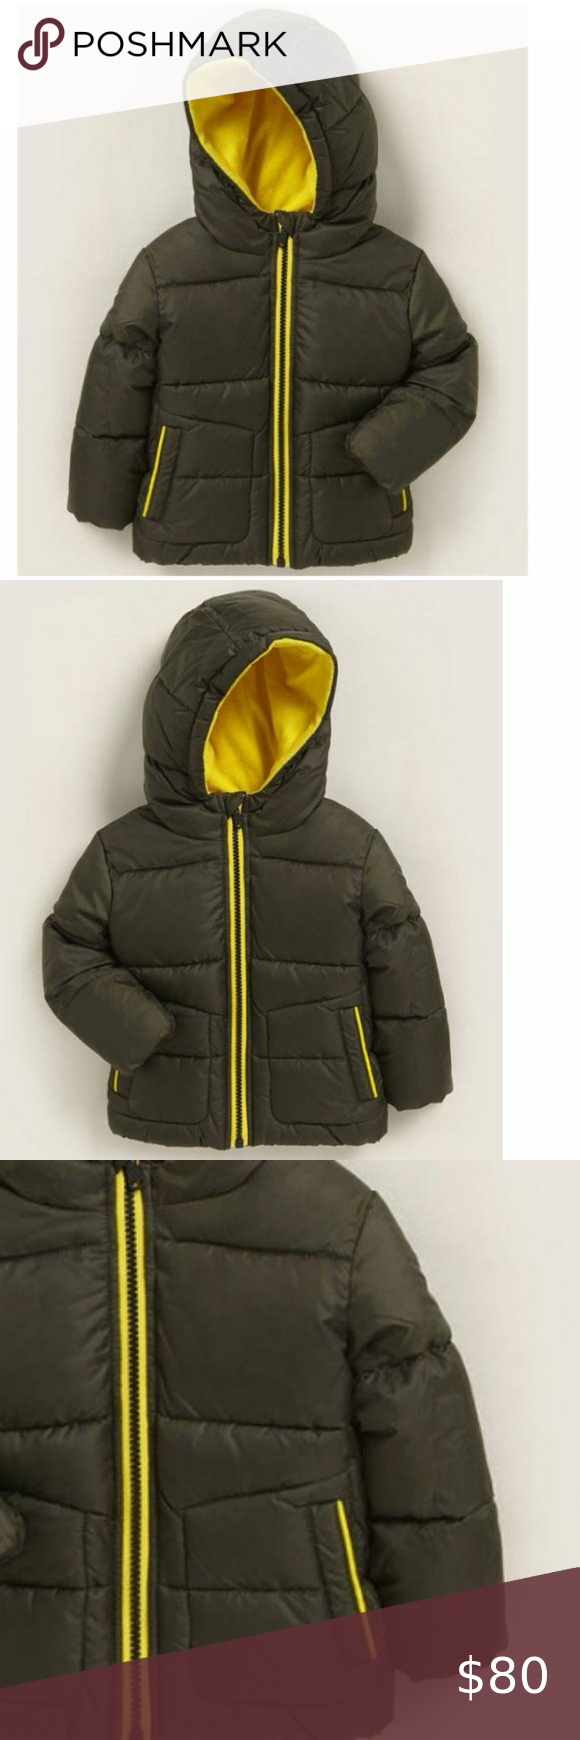 Michael Kors Boys Green Hooded Puffer Jacket 24 M Boys Puffer Jacket Girls Winter Coats Baby Girl Jackets [ 1740 x 580 Pixel ]